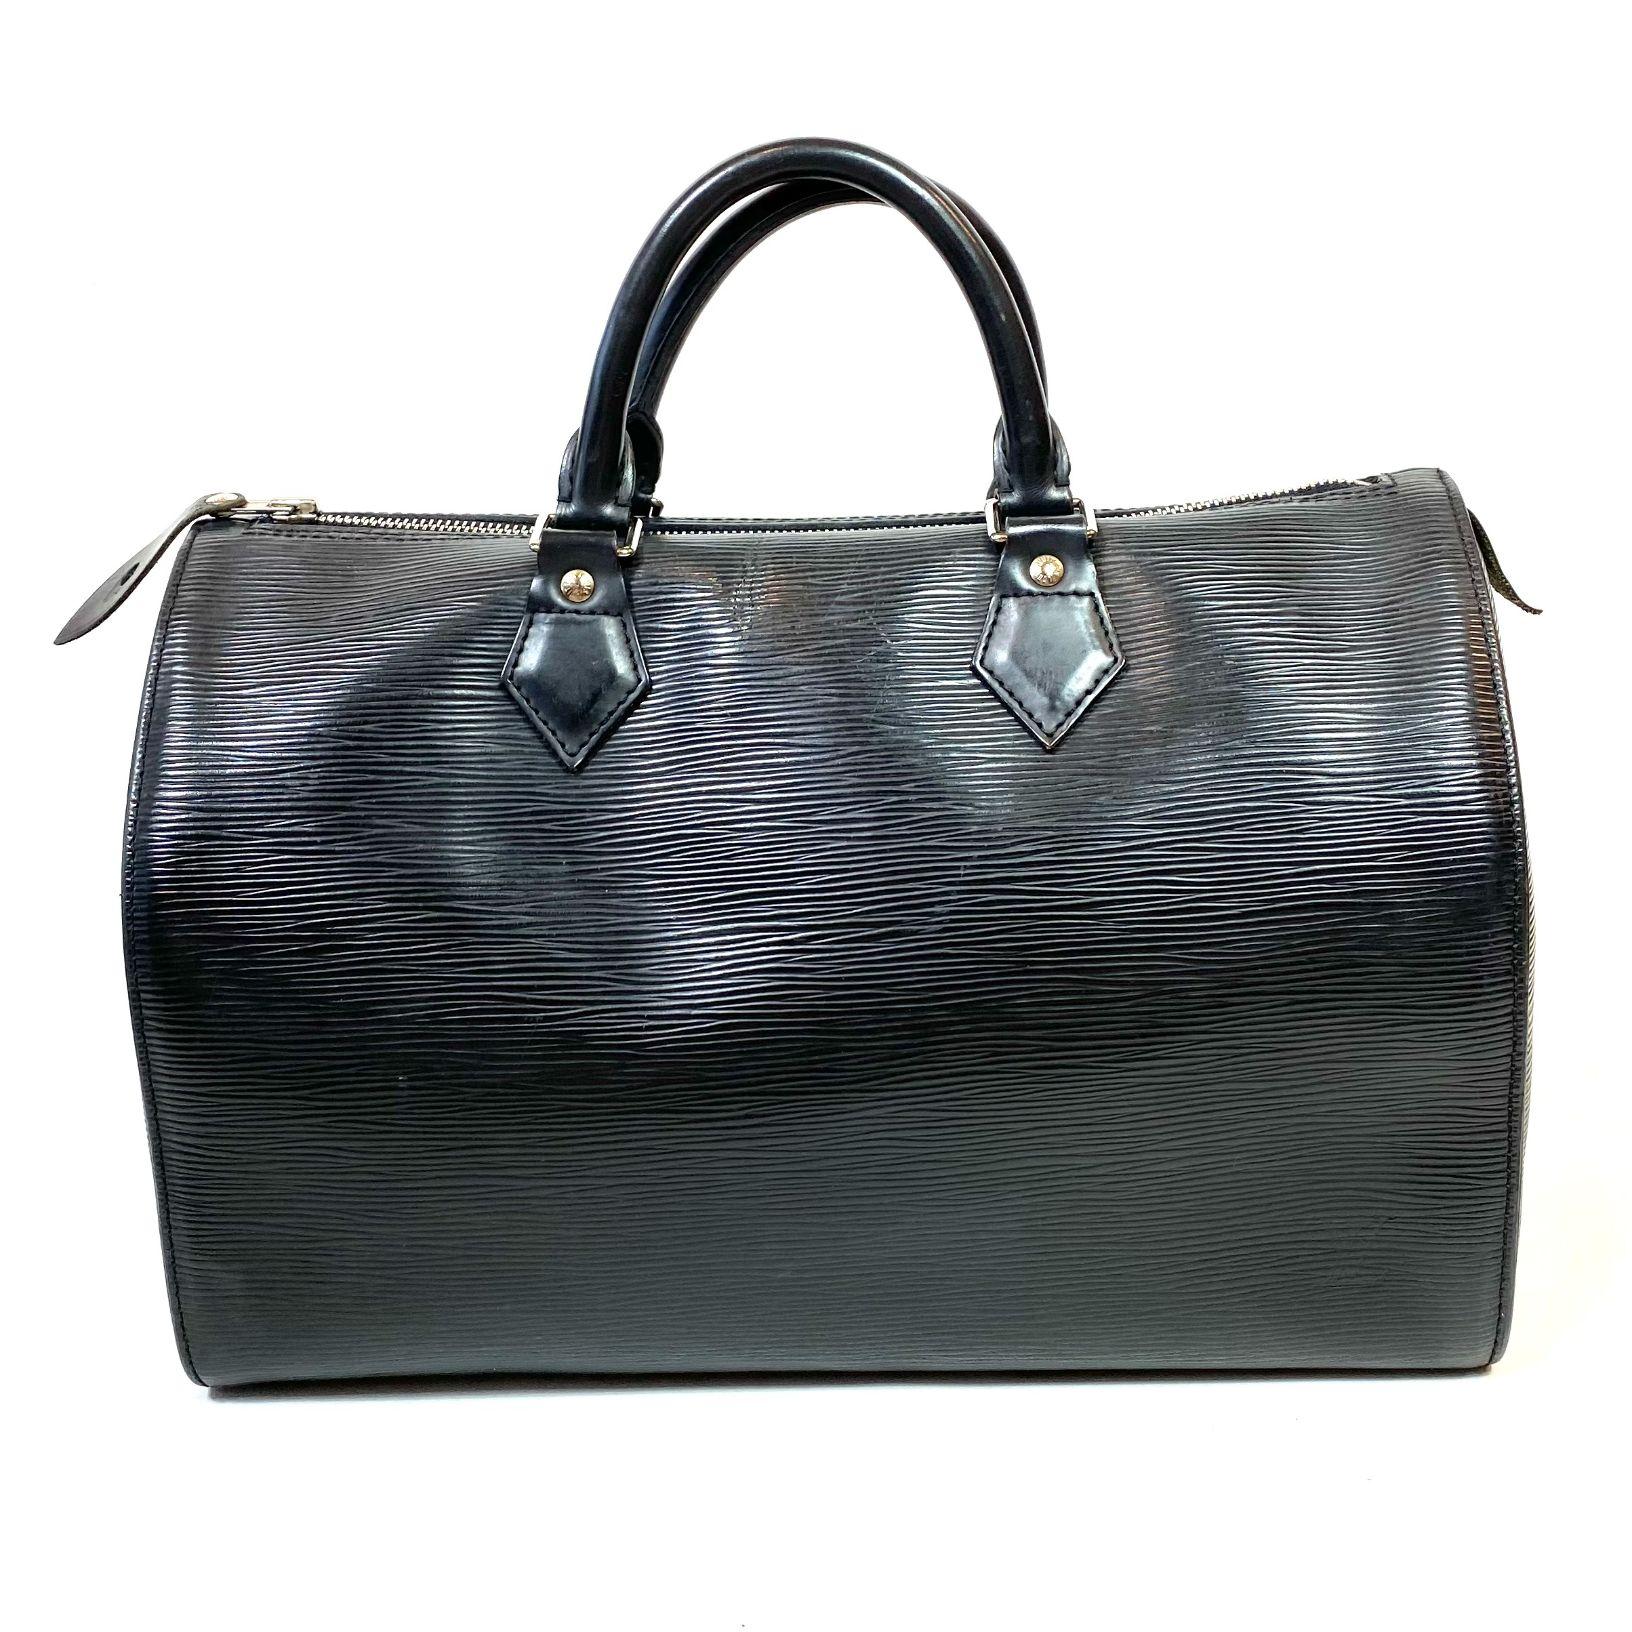 Bolsa Louis Vuitton Speedy 30 Epi Preta